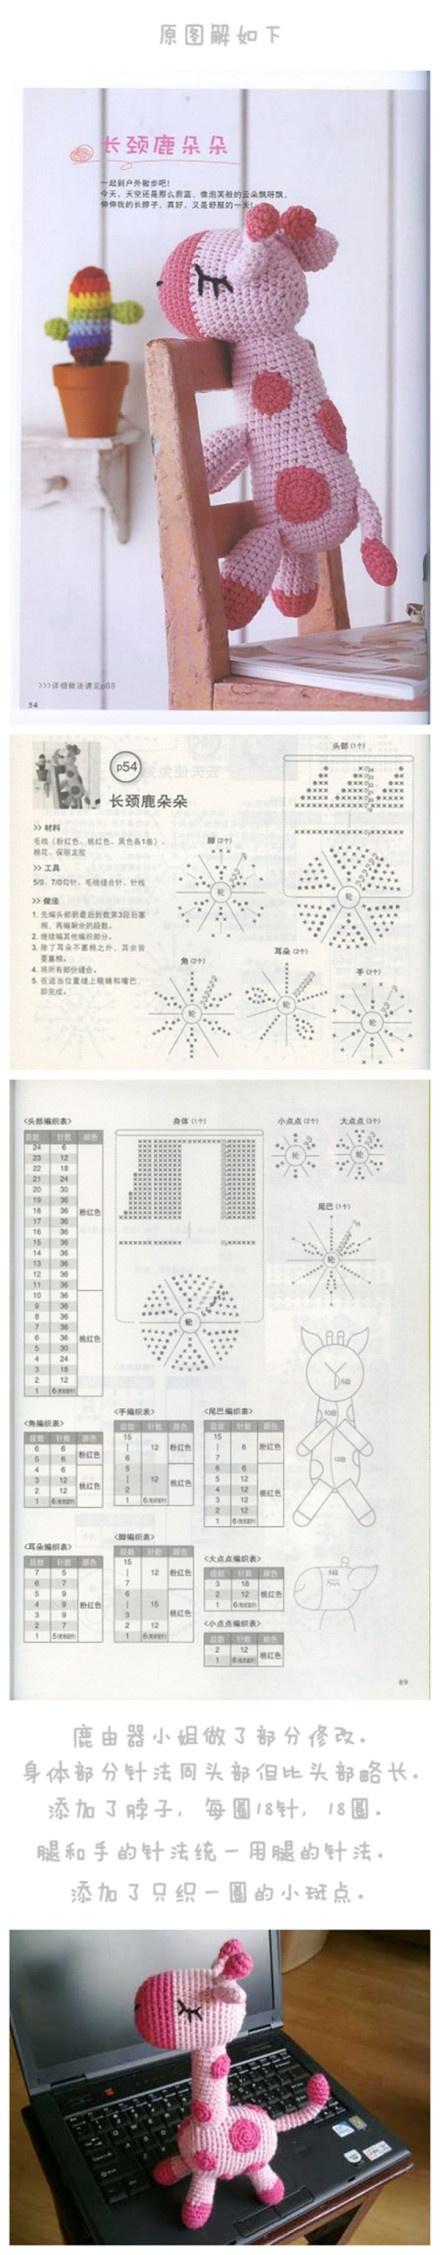 Cute Kawaii Amigurumi Patterns : 17 Best images about ~ CROCHET Japanese ~ on Pinterest ...